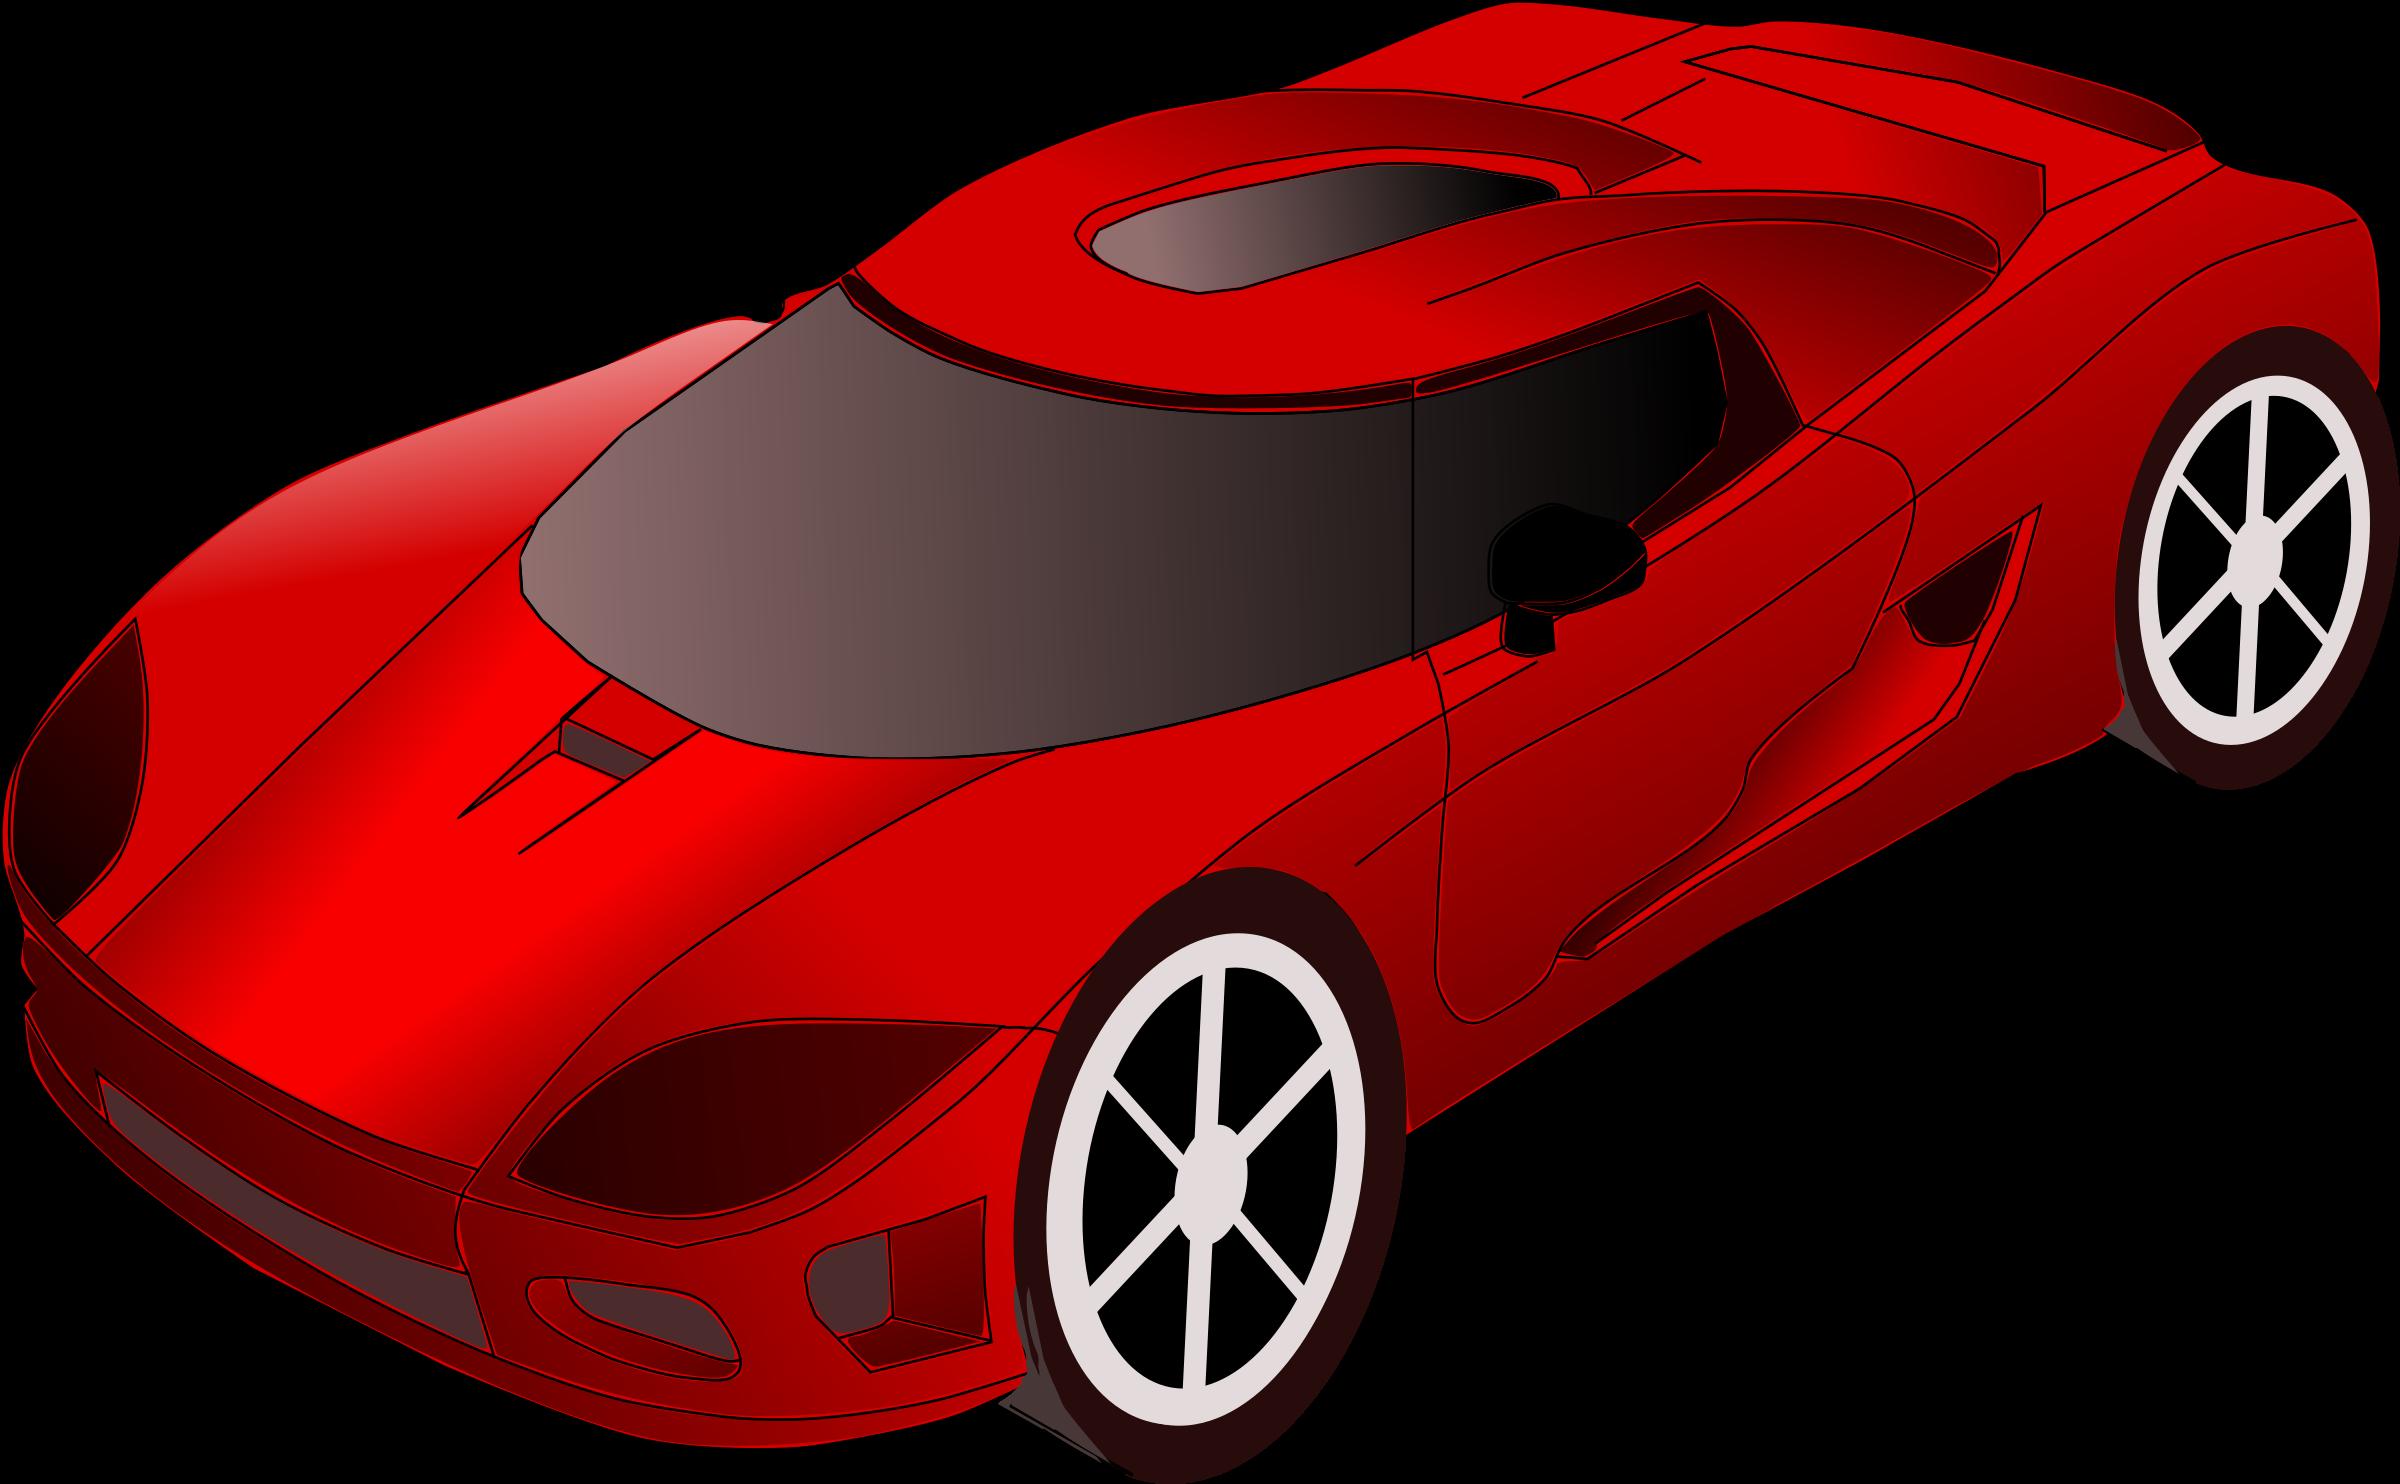 45 Top View Of Car Clipart Images Album Sports Car Wallpaper Sports Car Sport Cars